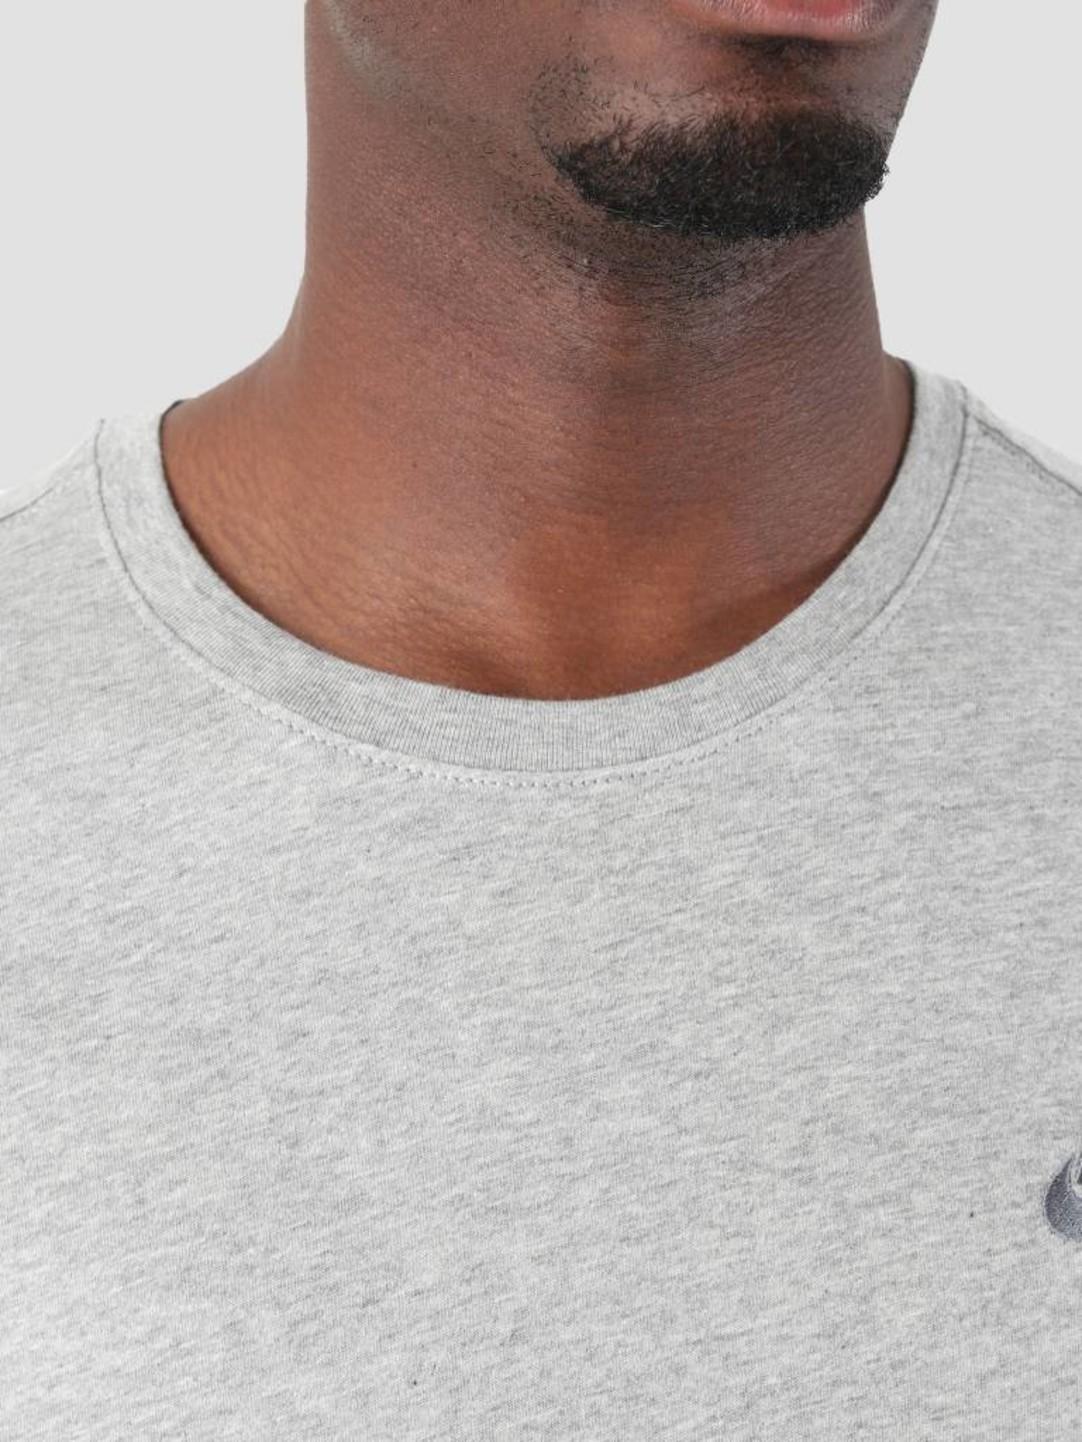 Nike Nike NSW DK T- Shirt Grey Heather Cool Grey 827021-063